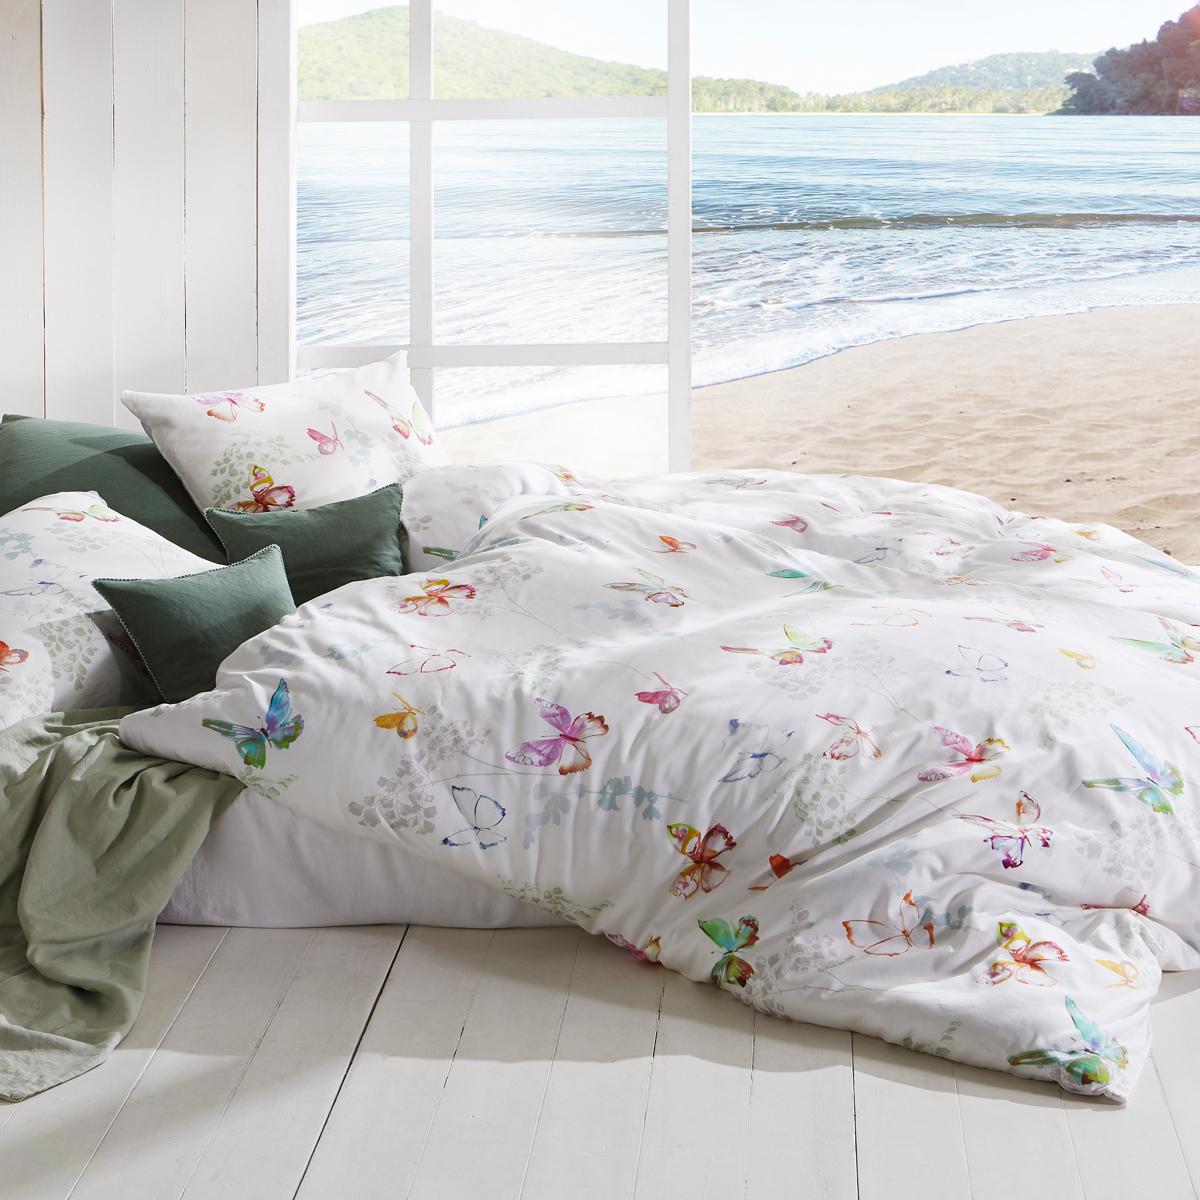 Mako-Satin Bettwäsche fleuresse Bed Art S Fantasy/&Flowers glory Dunkelblau